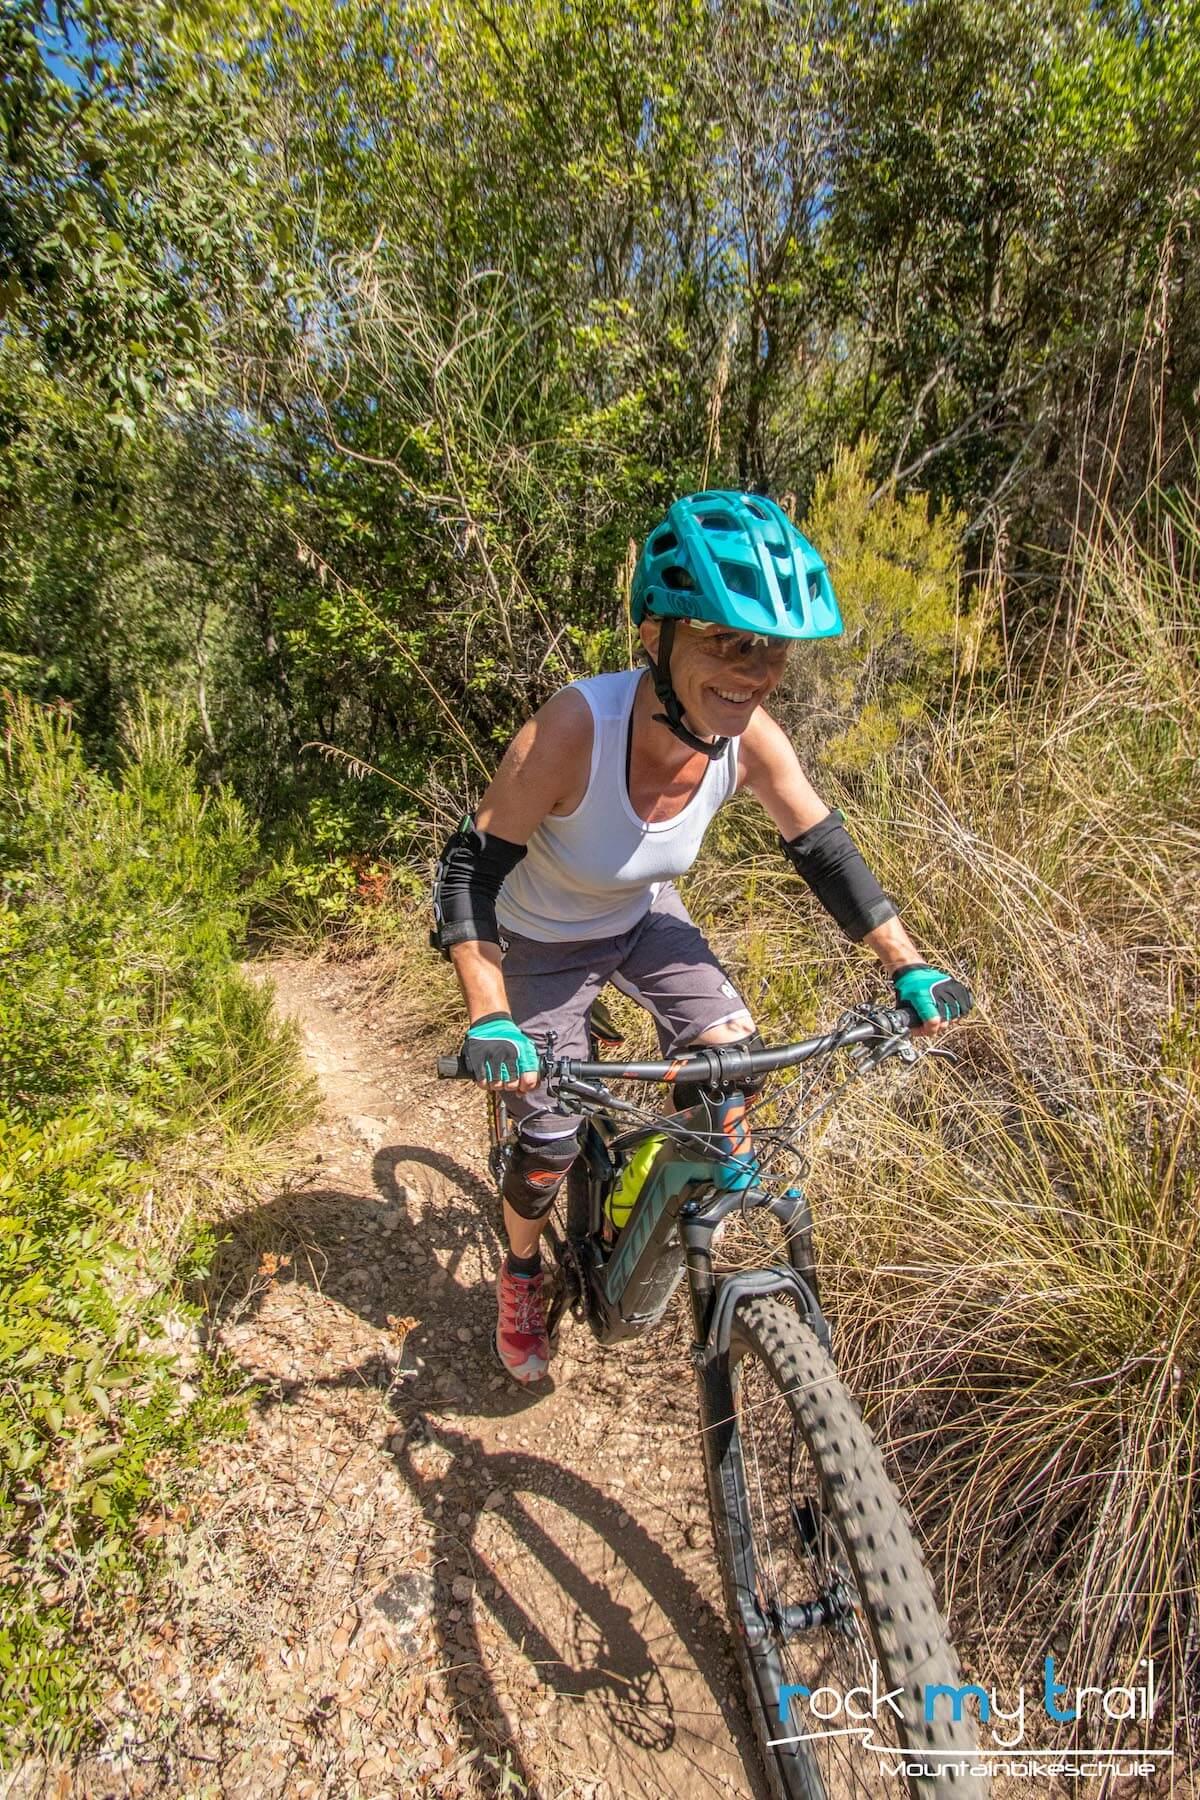 MTB Reise Toskana Trailparadies Bike Reise Paare. - Rock my Trail